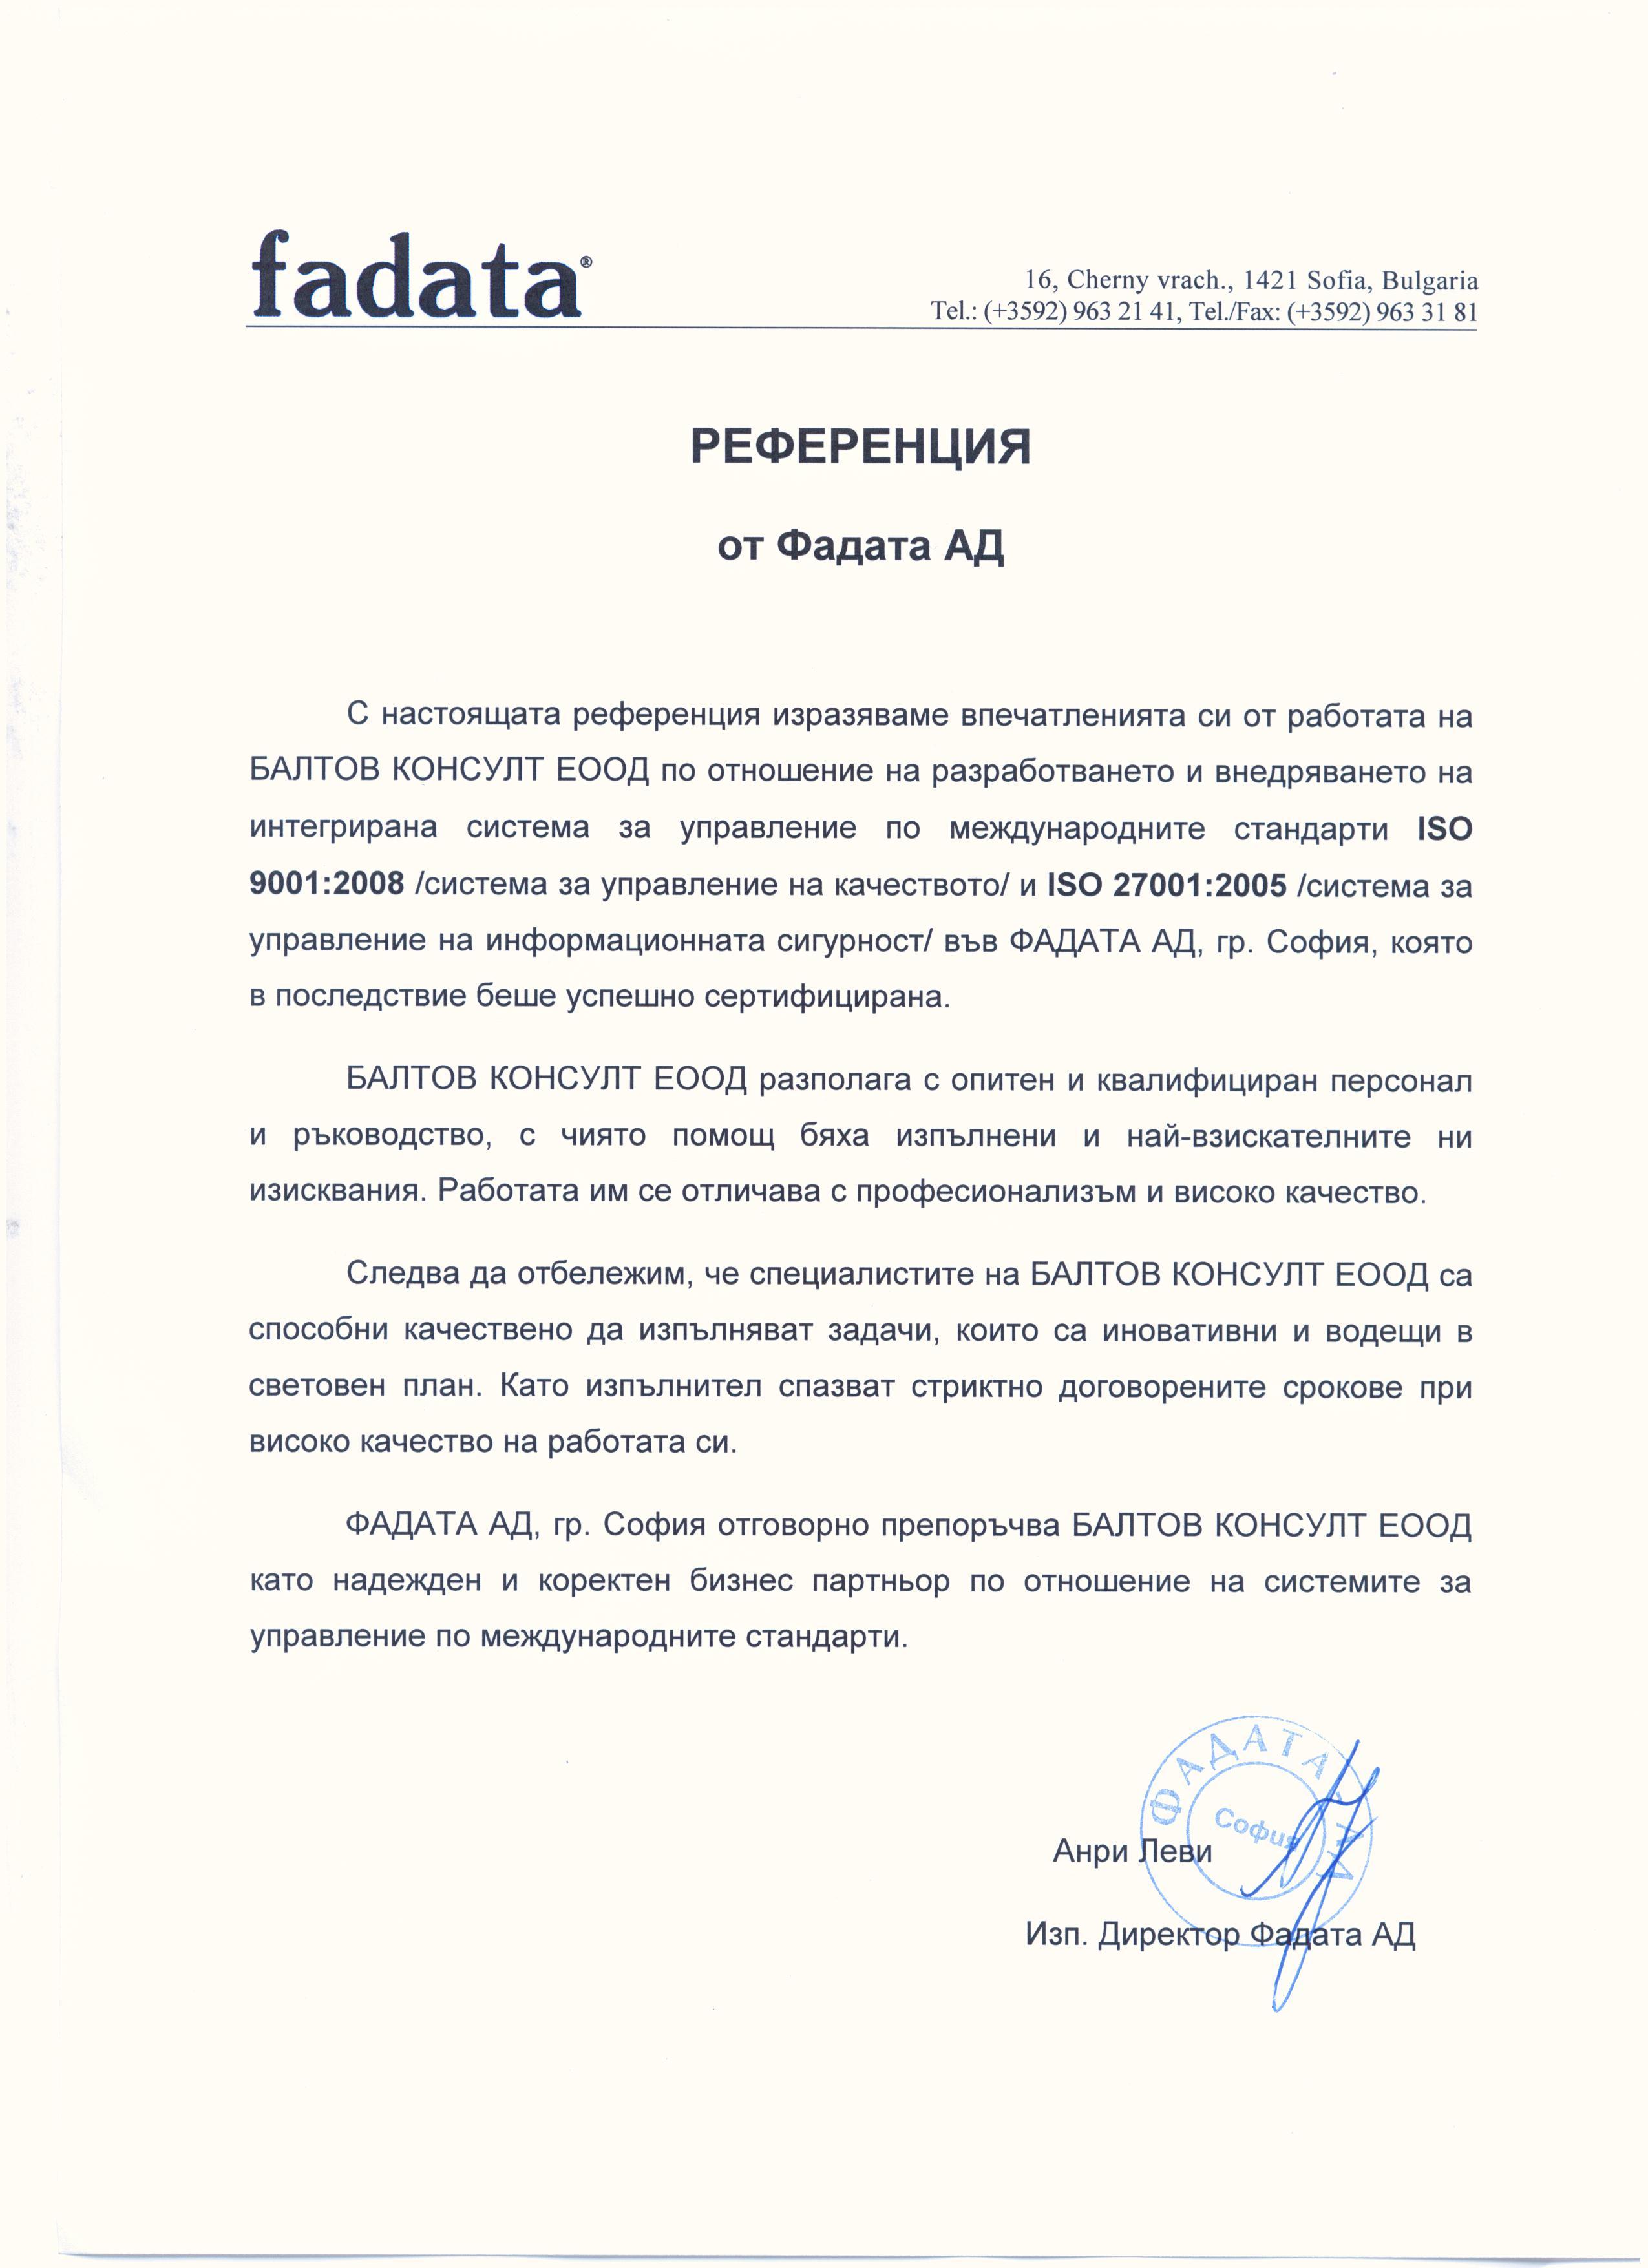 Фадата АД гр. София